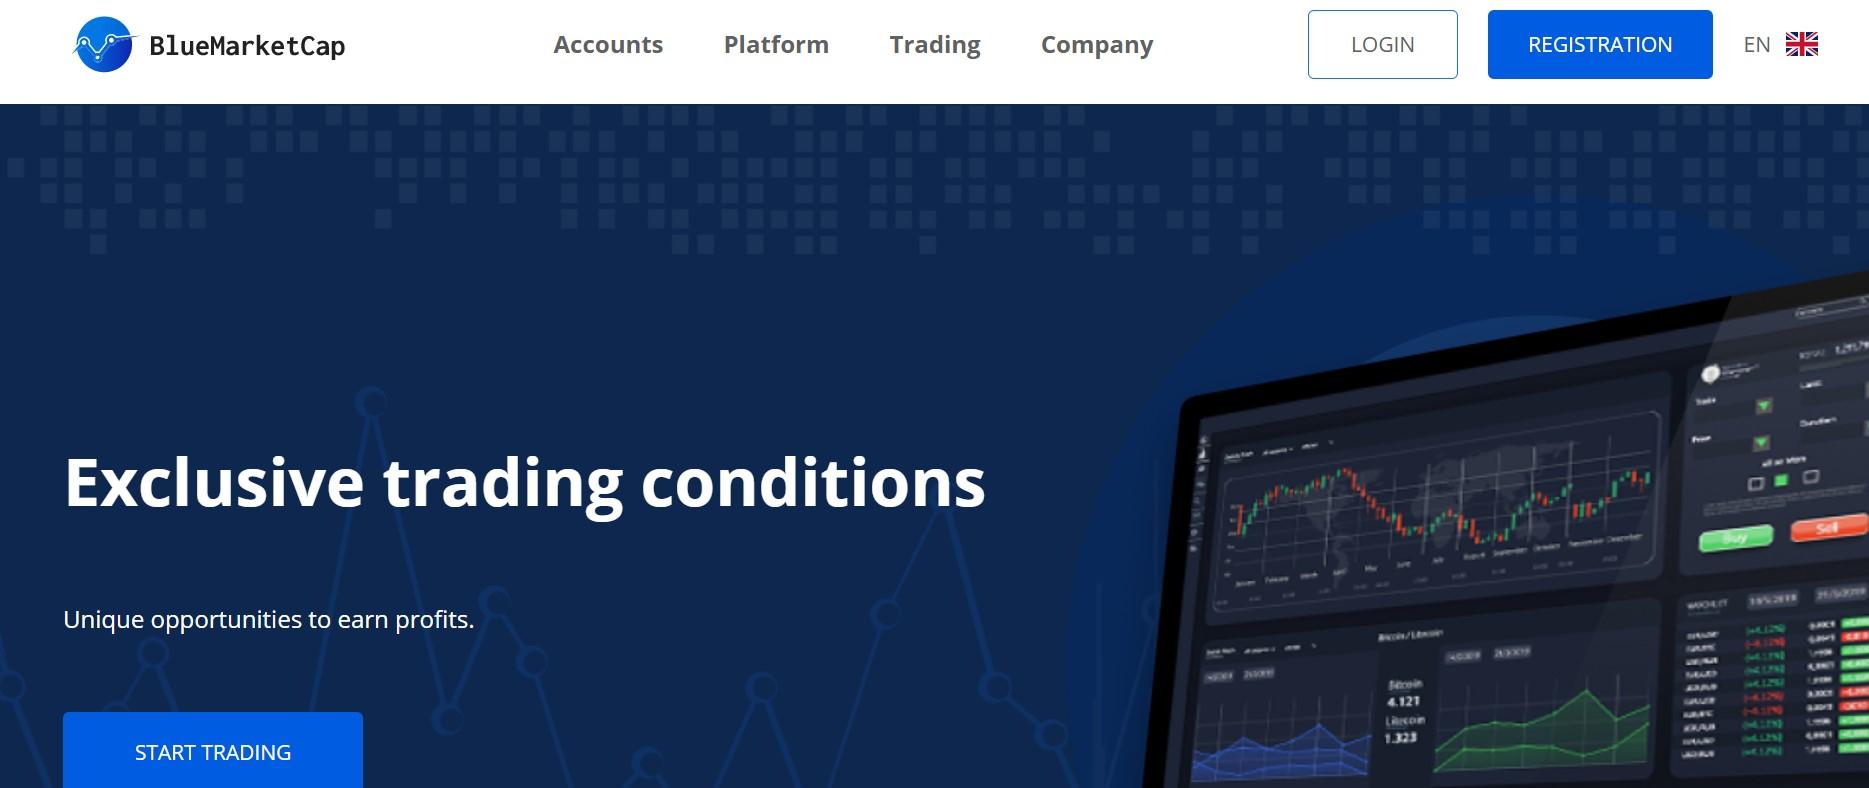 BlueMarketCap website